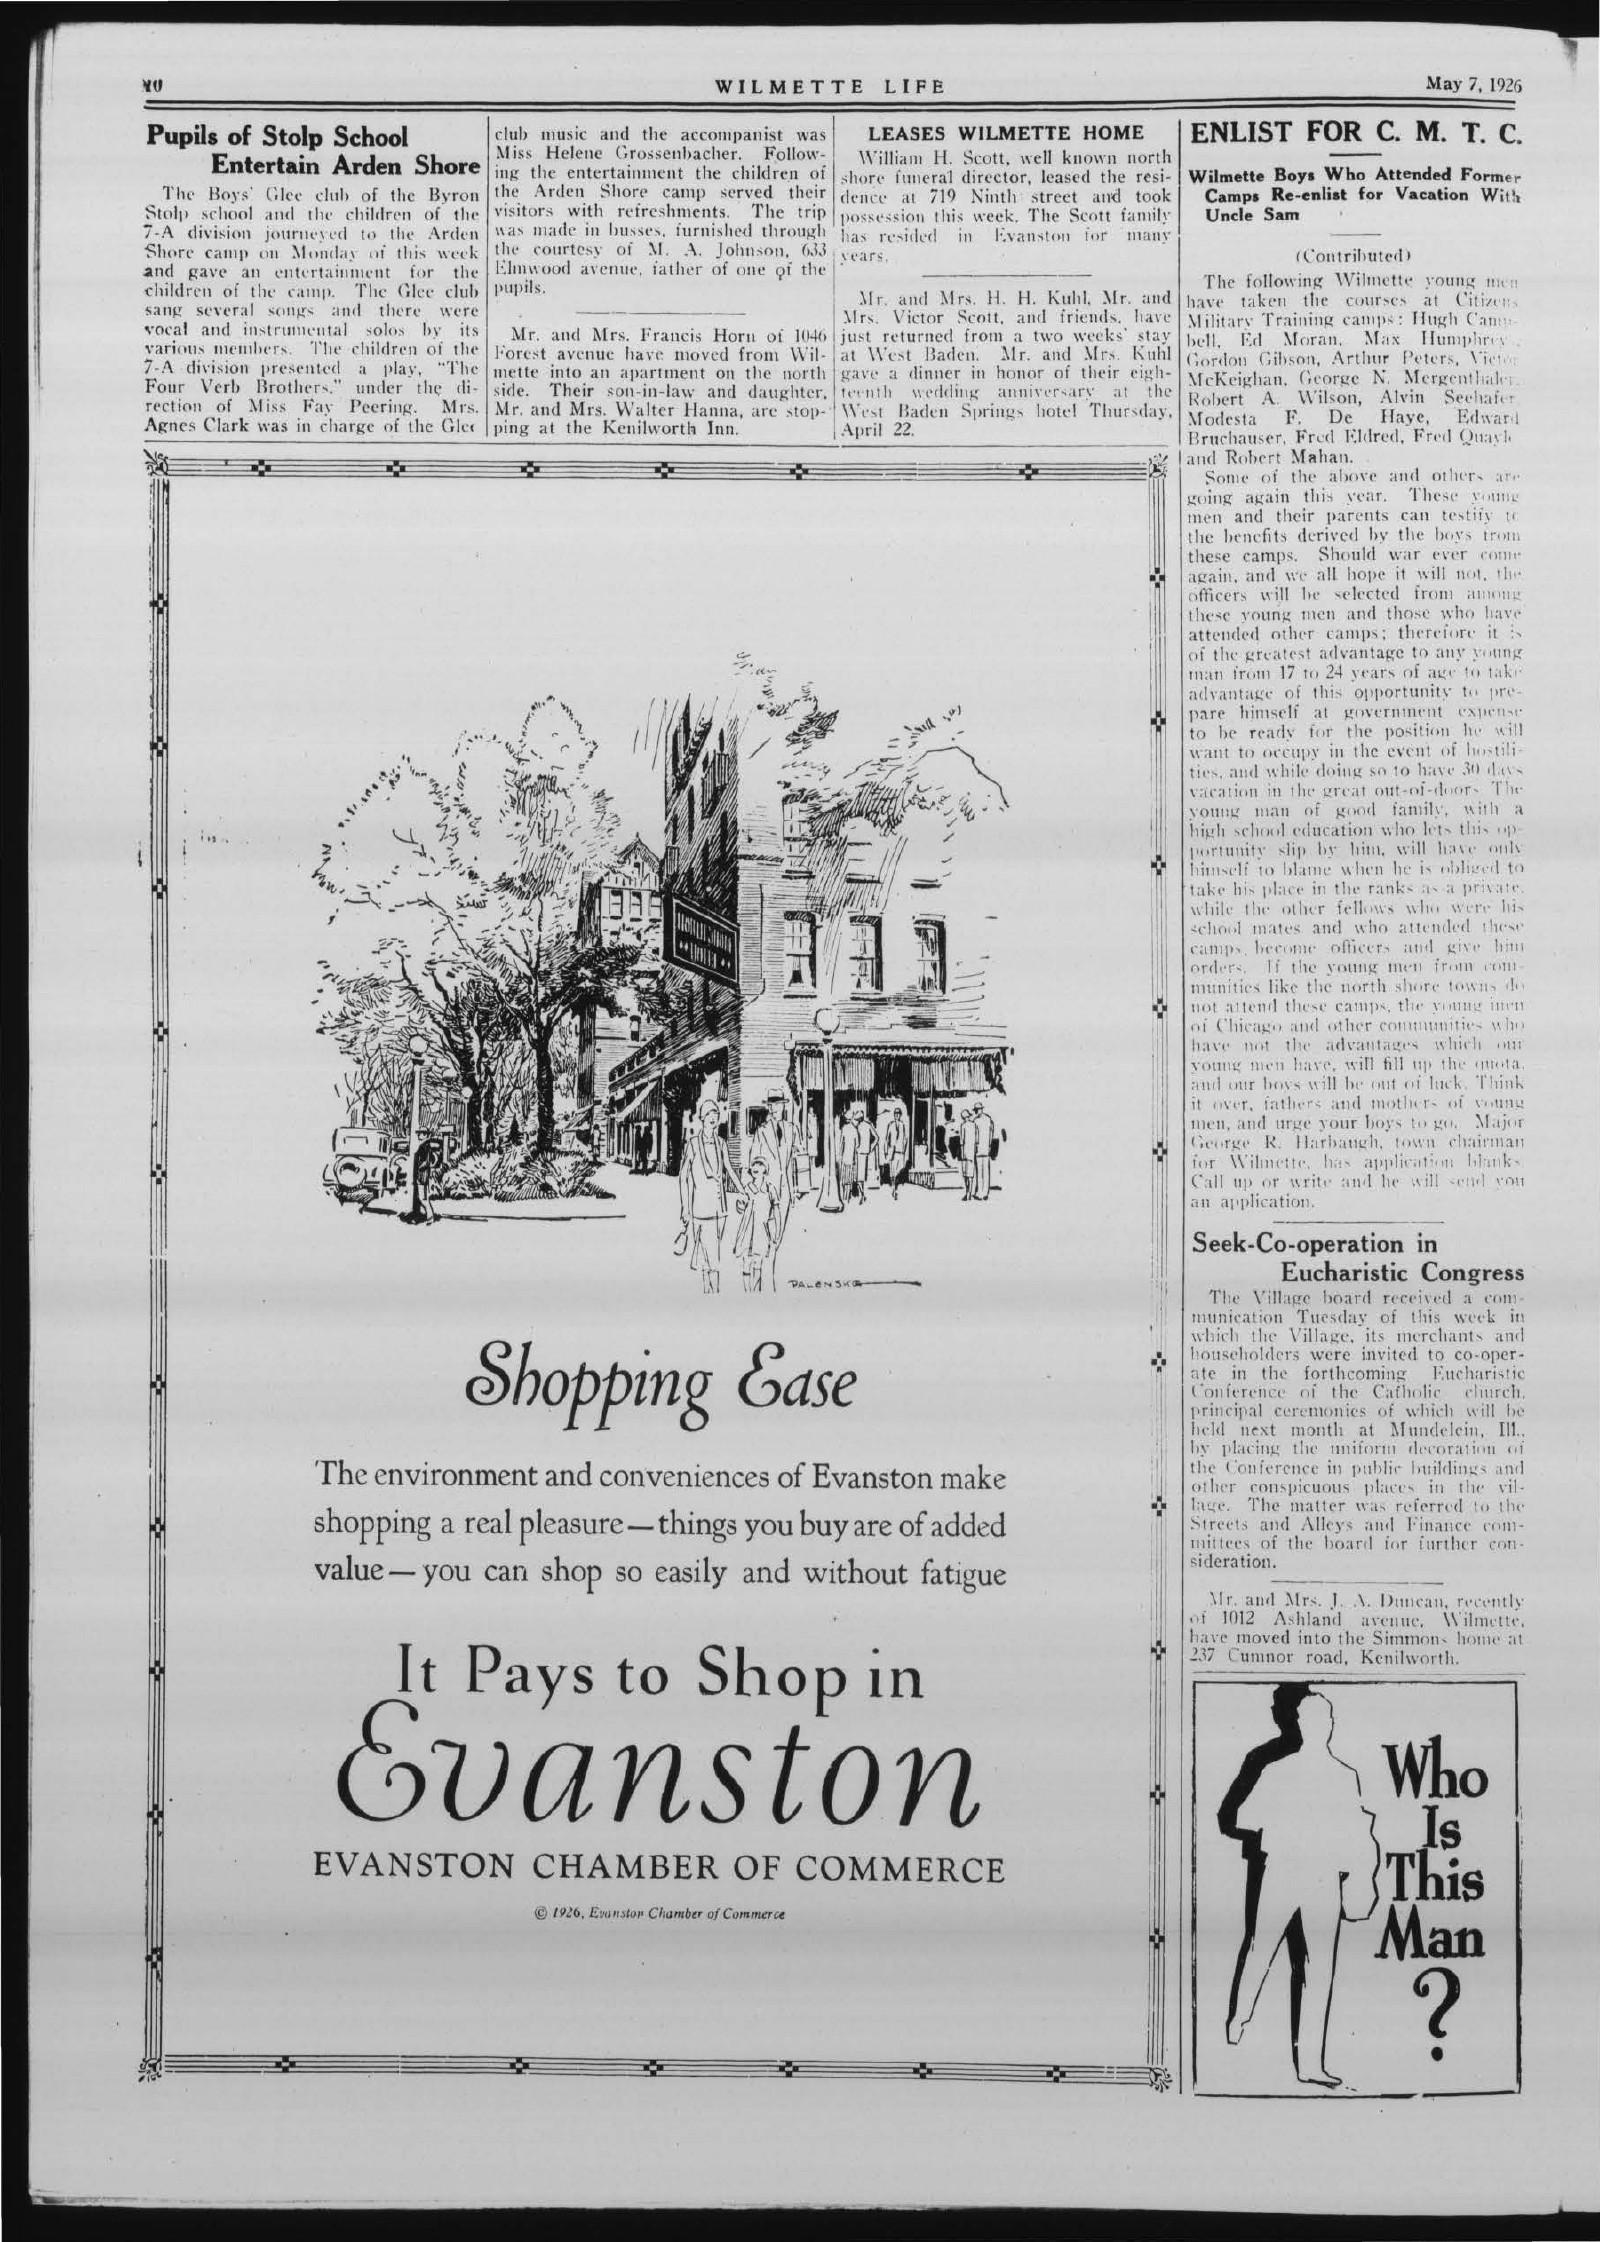 Wilmette Life (Wilmette, Illinois), 7 May 1926